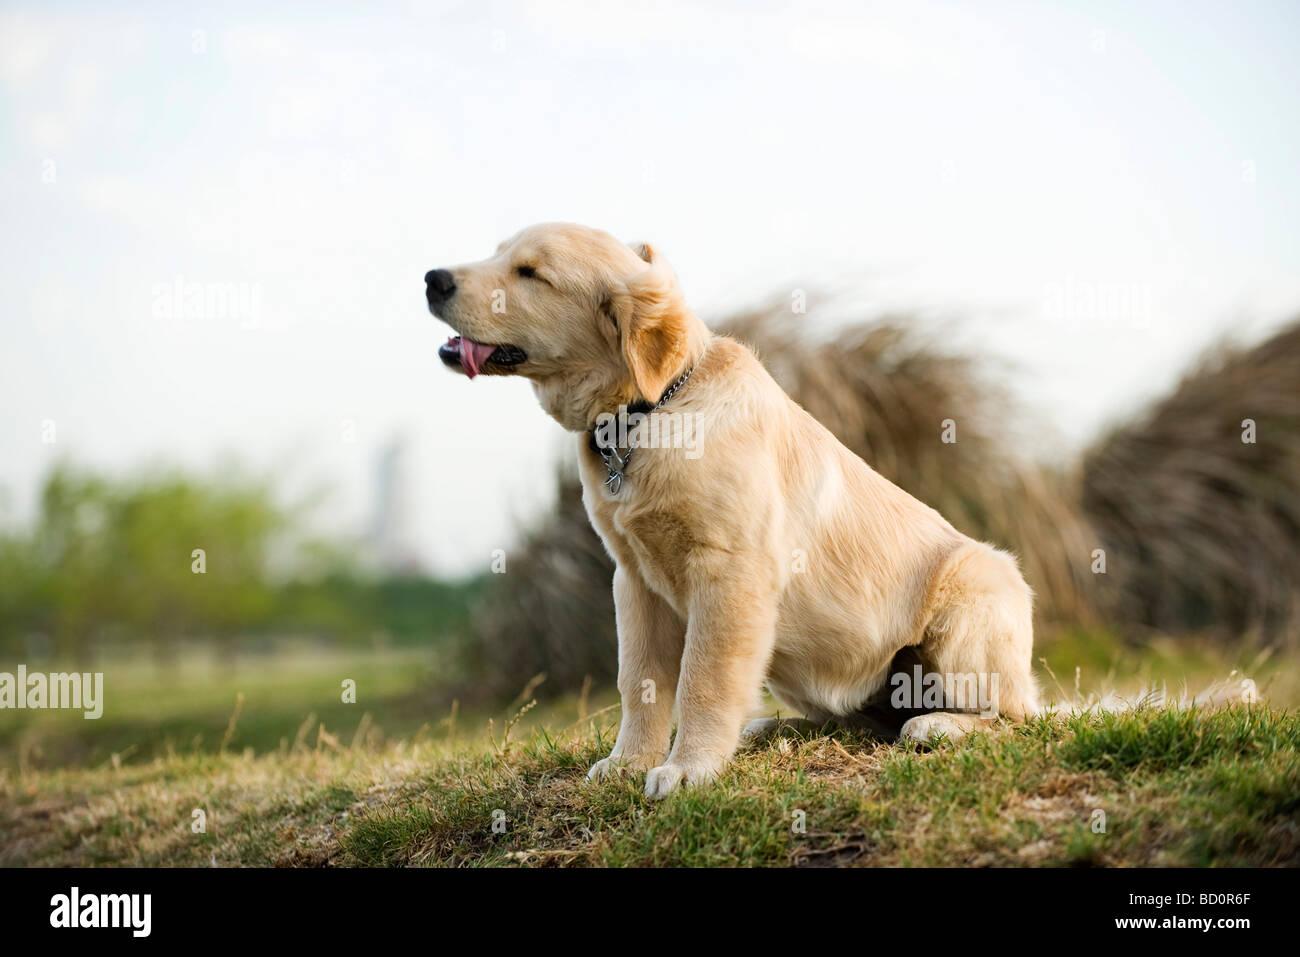 Golden retriever puppy panting - Stock Image